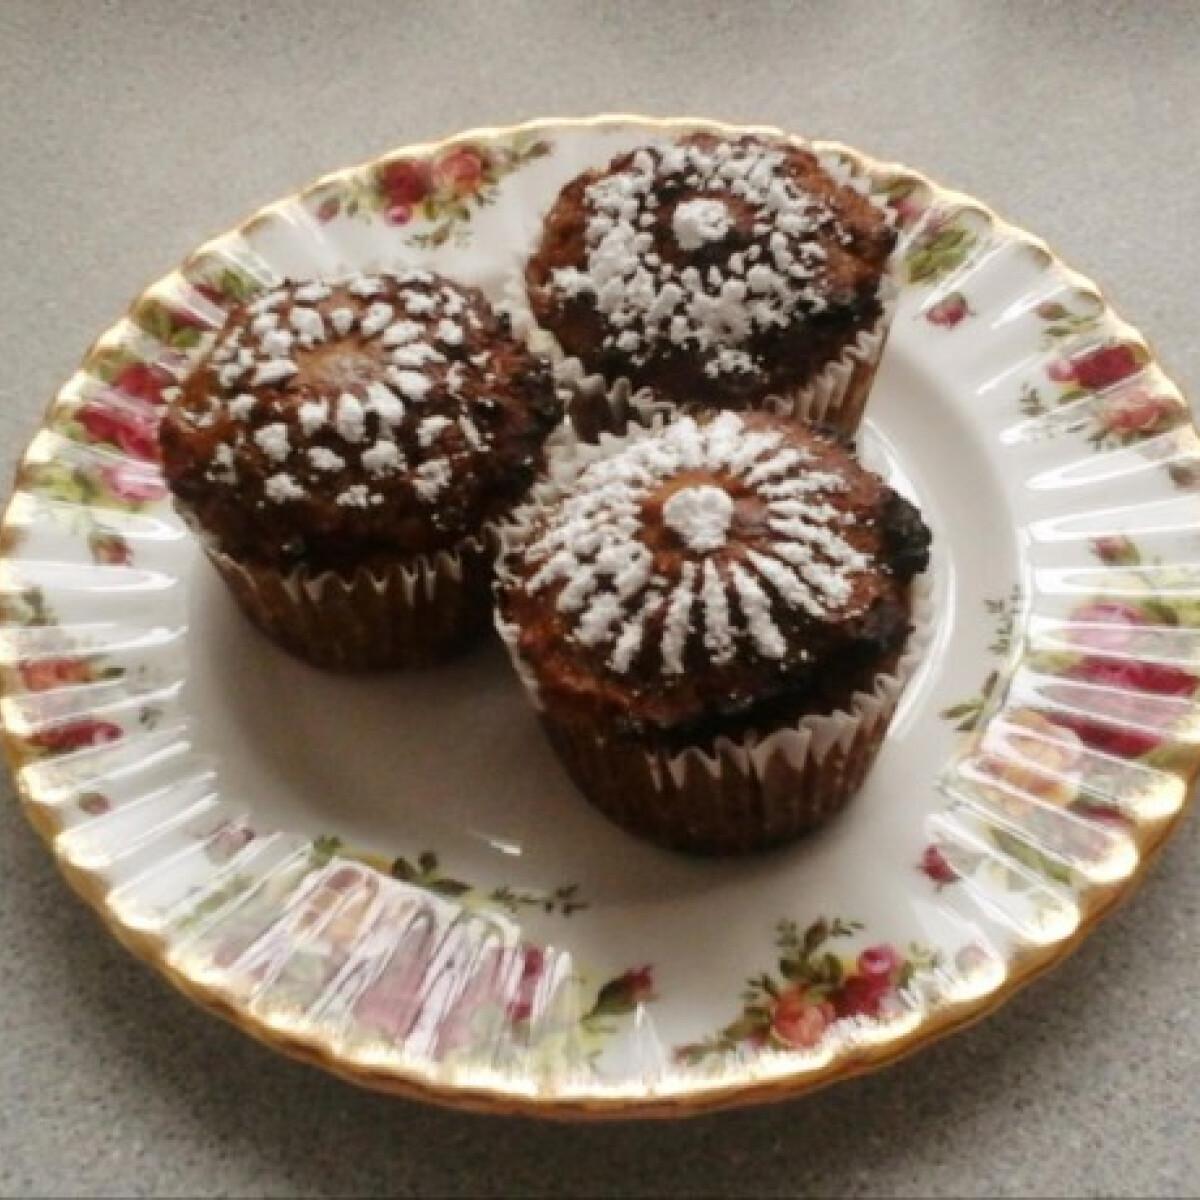 Ezen a képen: Paleo mandarinos sütőtök muffin